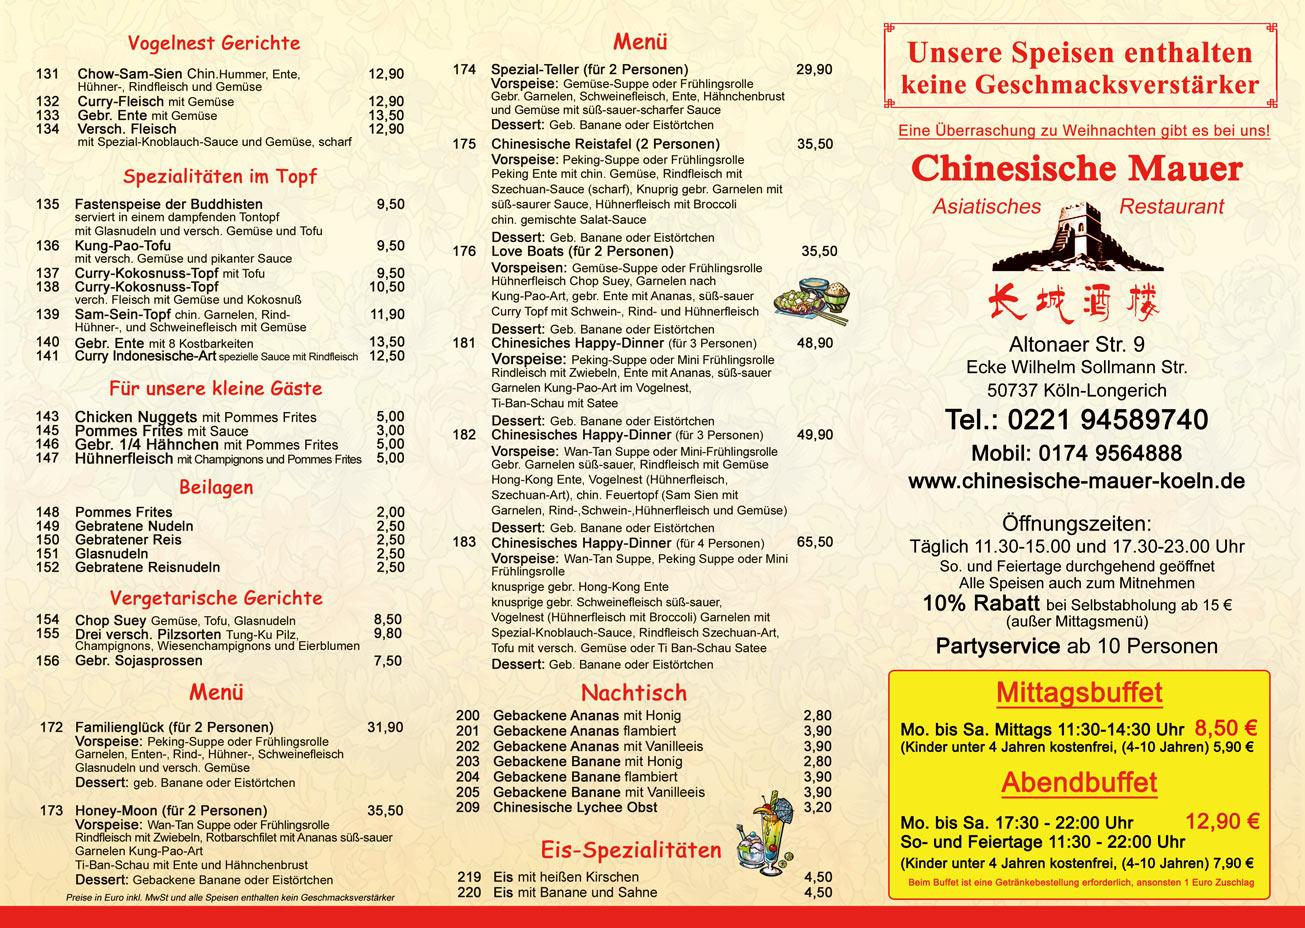 Karte China Mauer.Speisekarte China Mauer Restaurant Köln